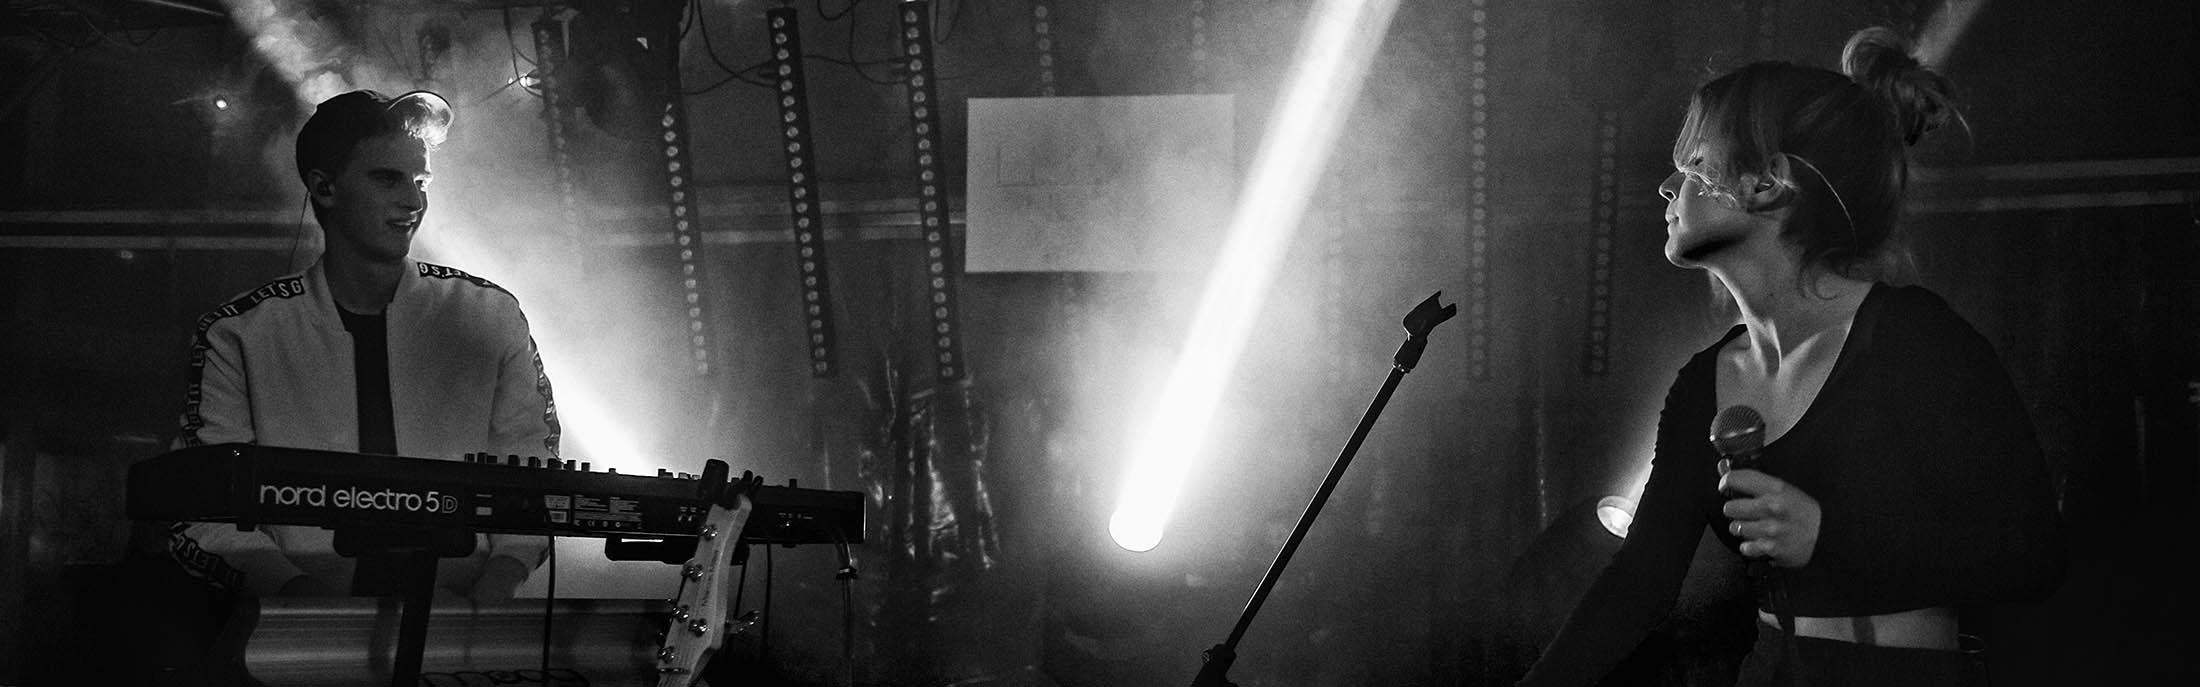 Linia Nocna fot Marta Rzepka